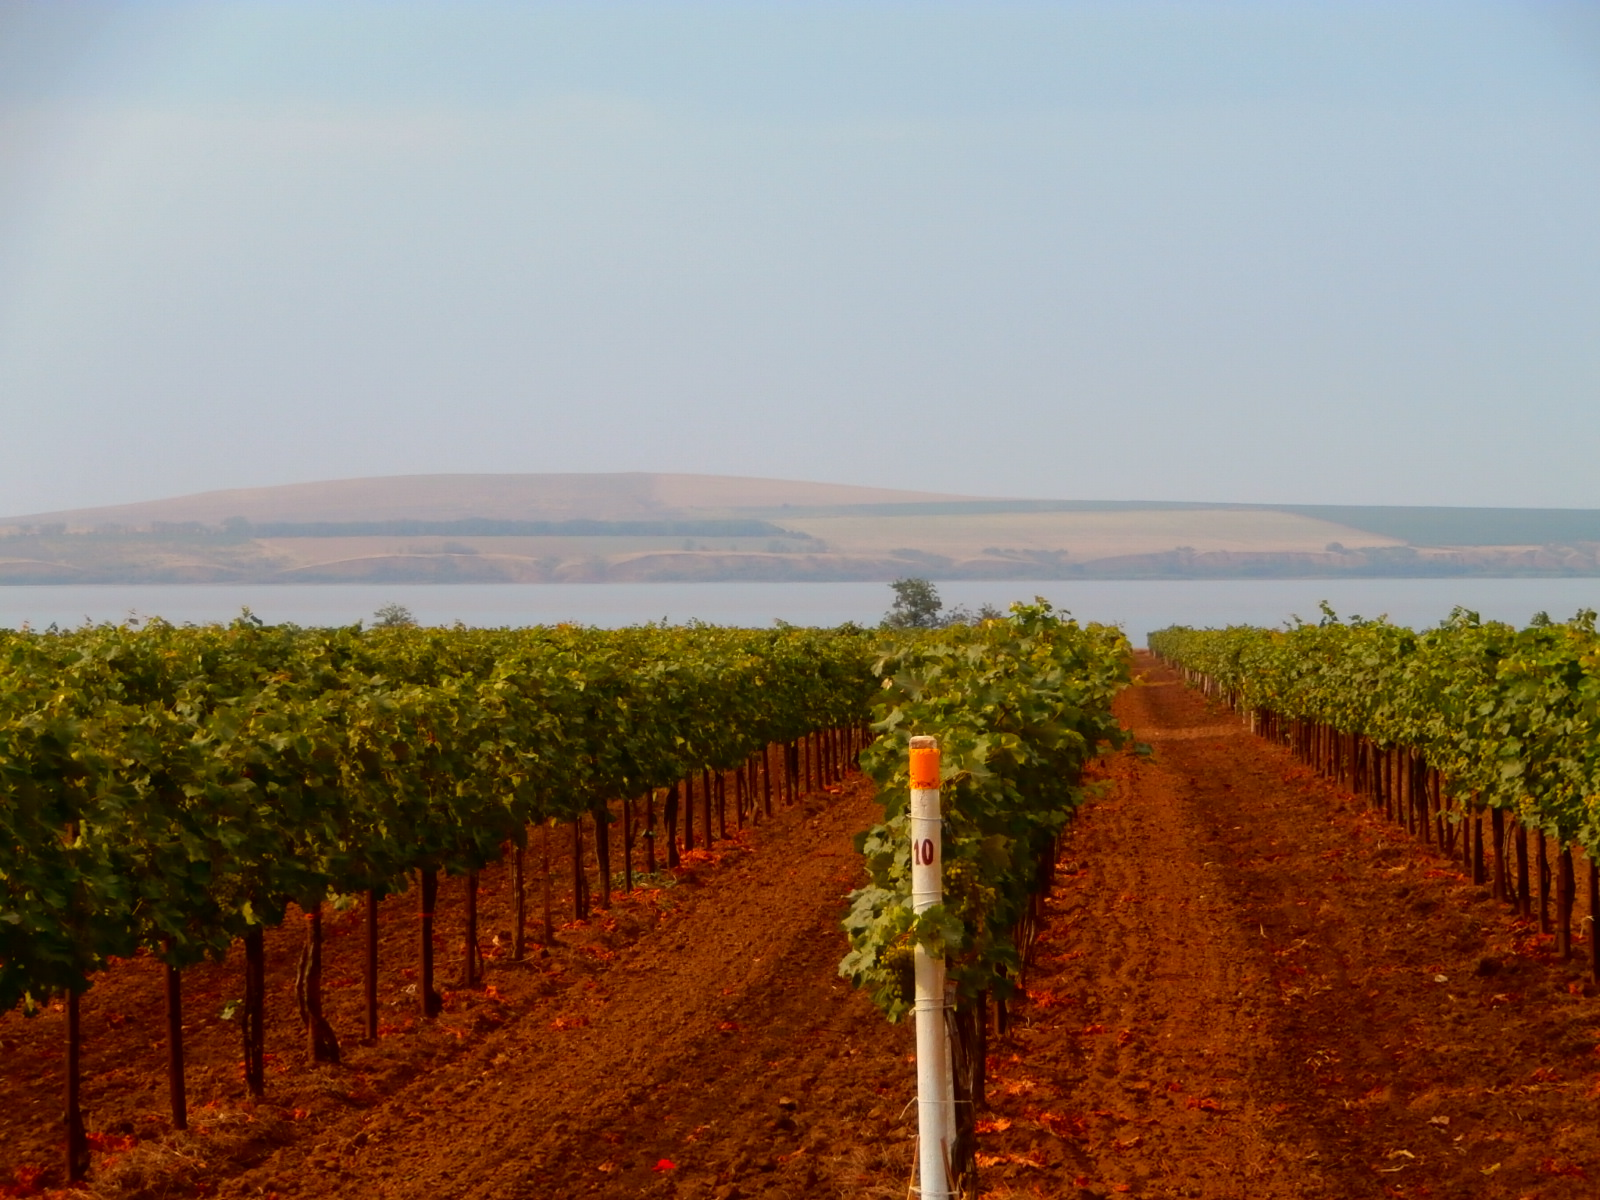 Бескрайние виноградники Тамани